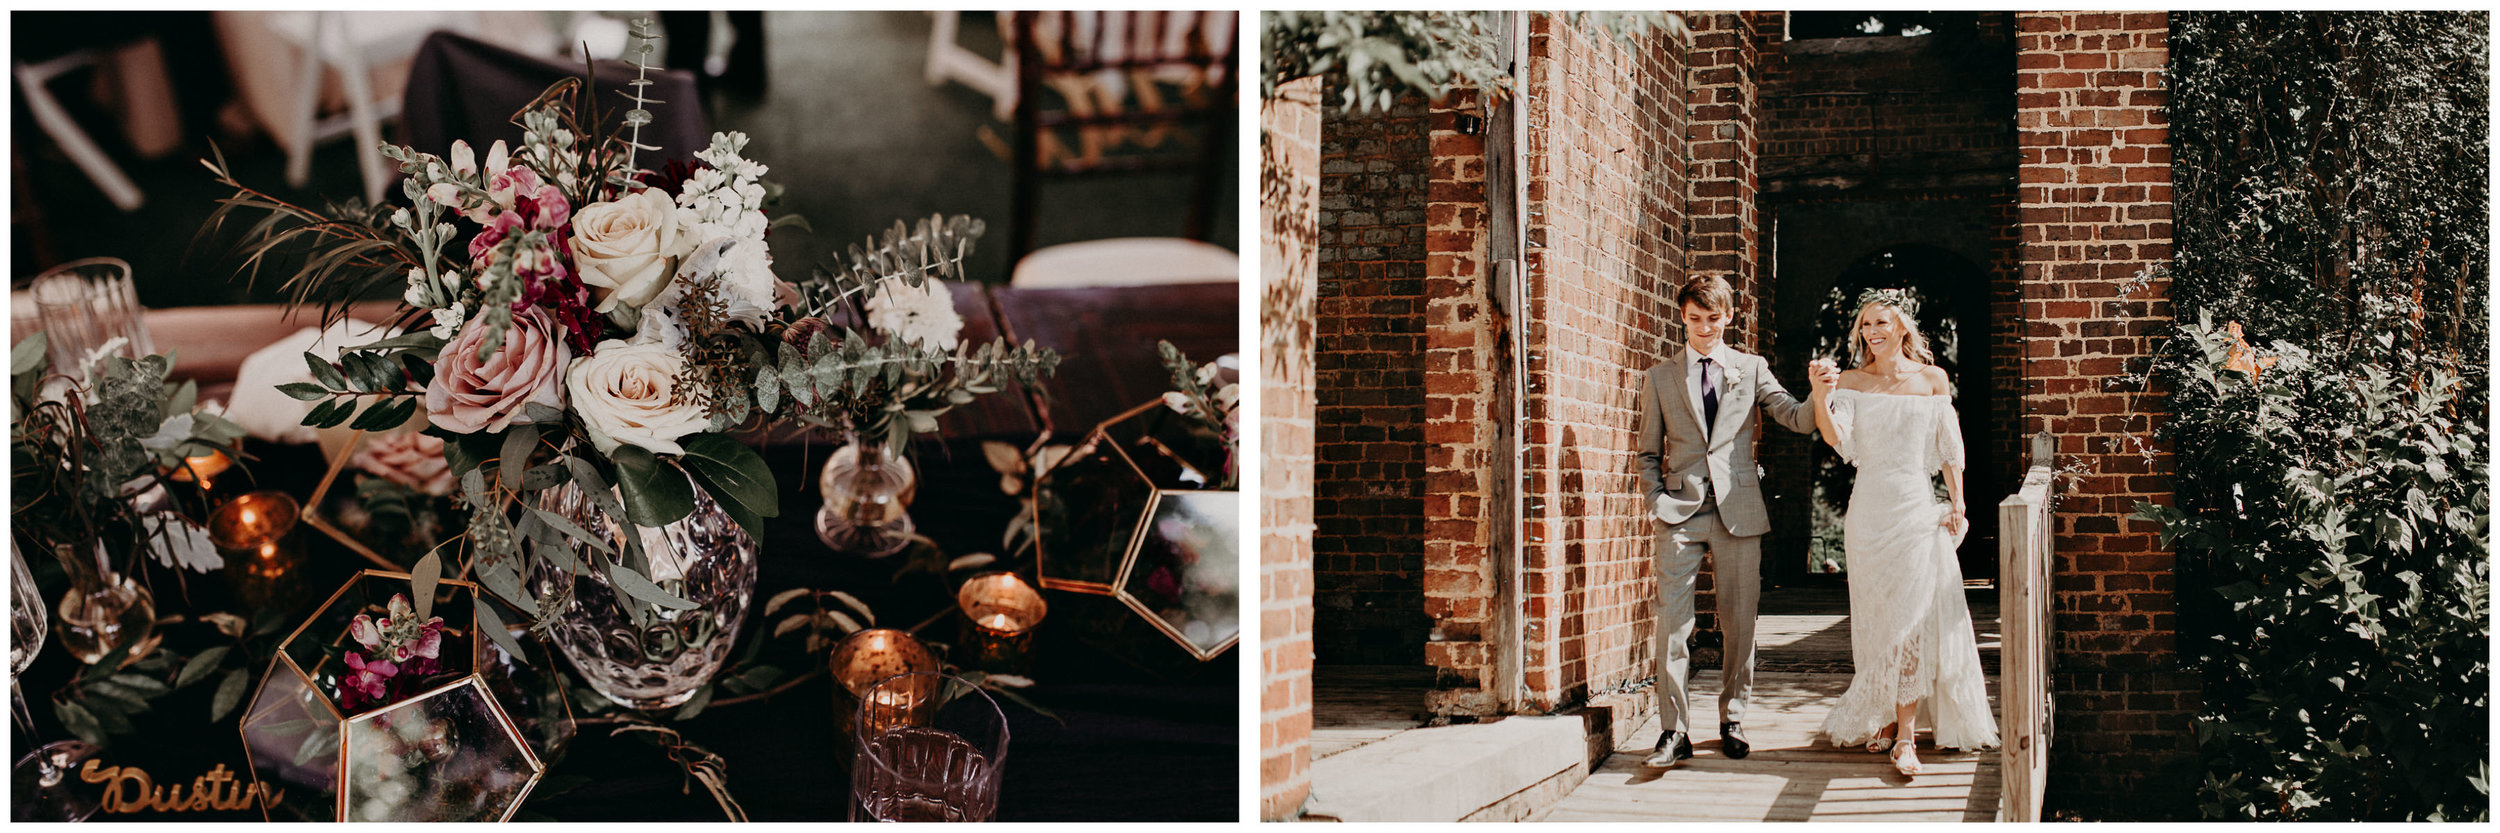 115 - Barnsley Gardens Wedding -Bride and groom portraits - Atlanta wedding photographer .jpg